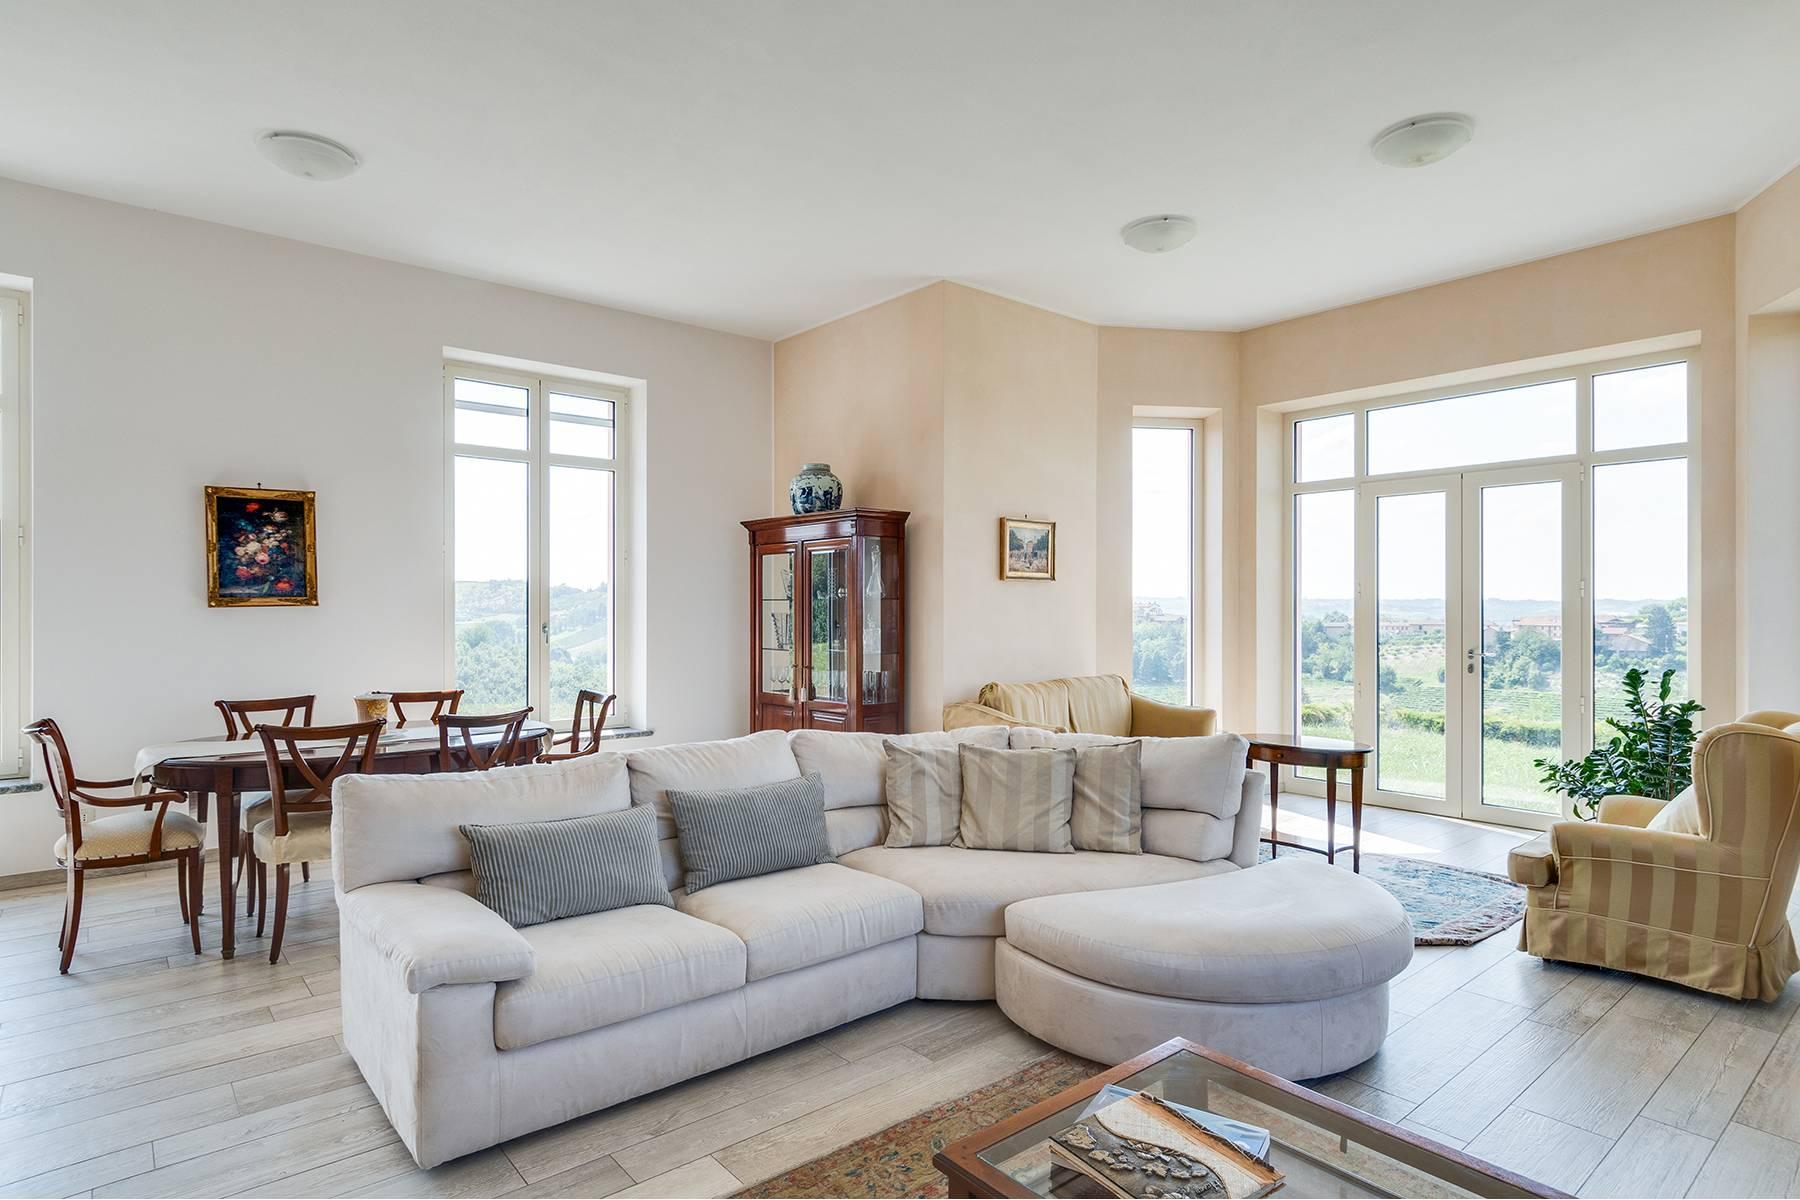 Moderne Villa im Herzen des Roero Gebiets - 4